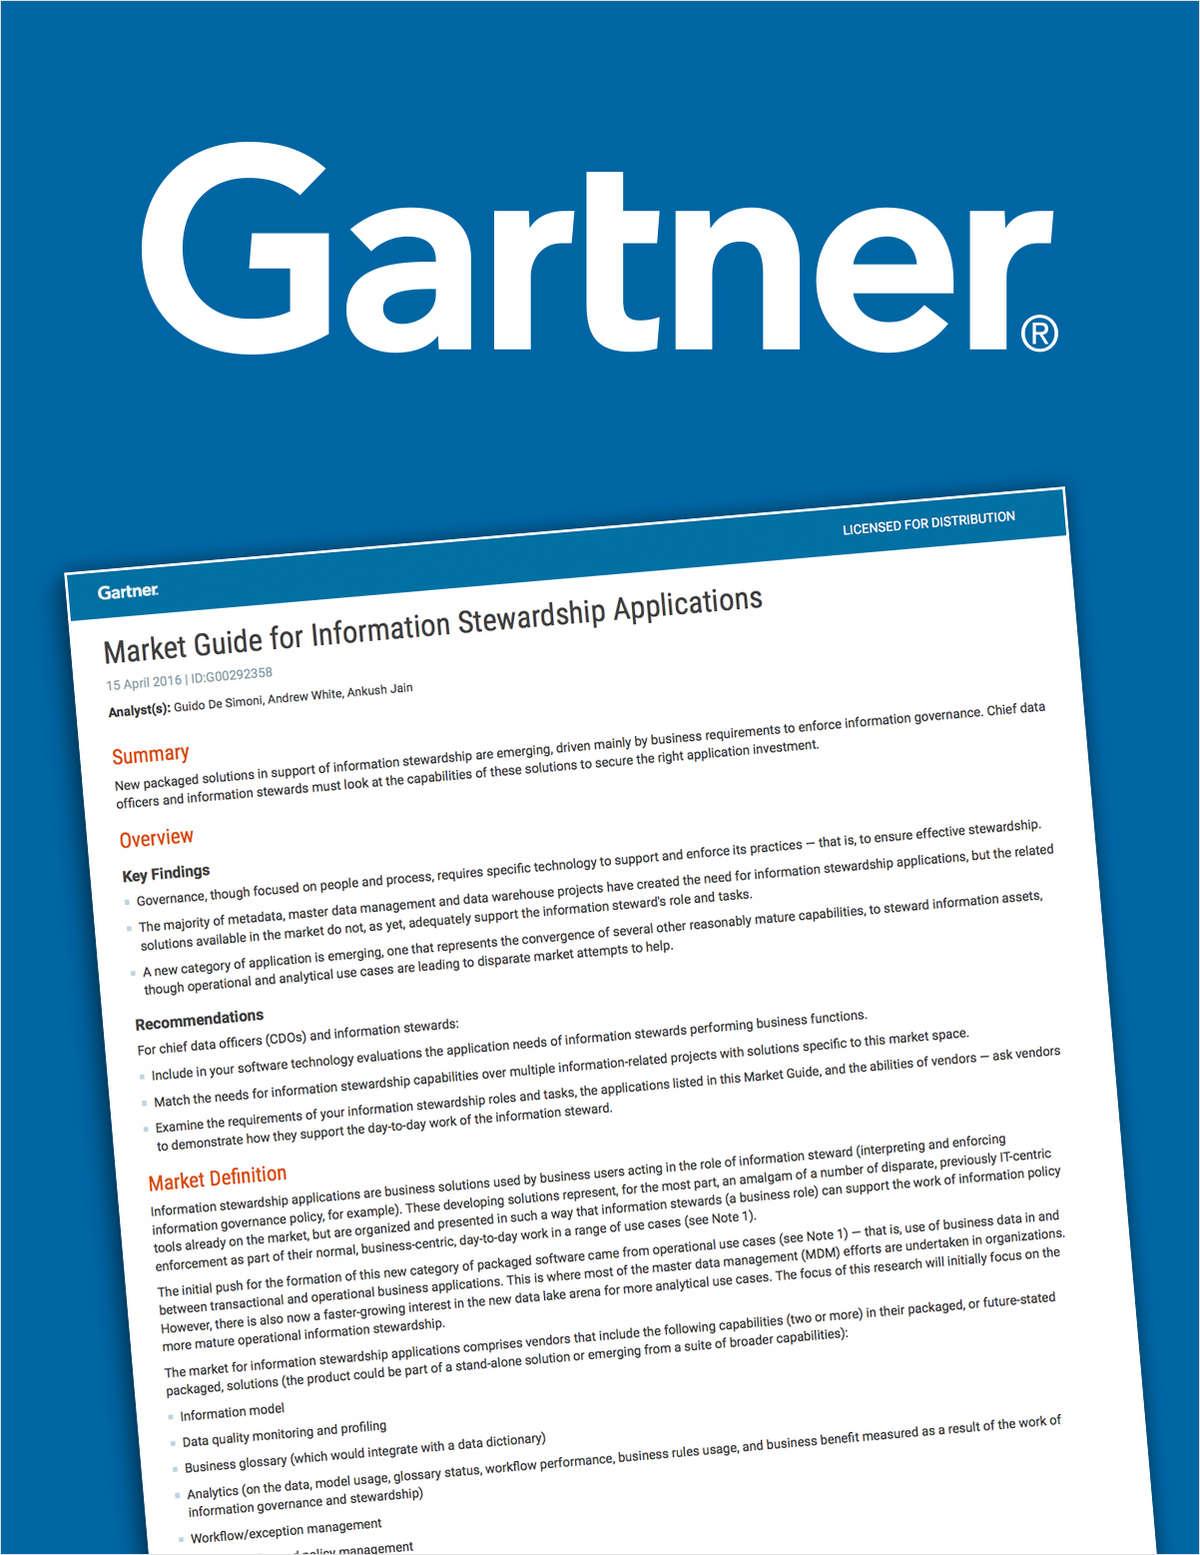 Gartner Market Guide for Information Stewardship Applications